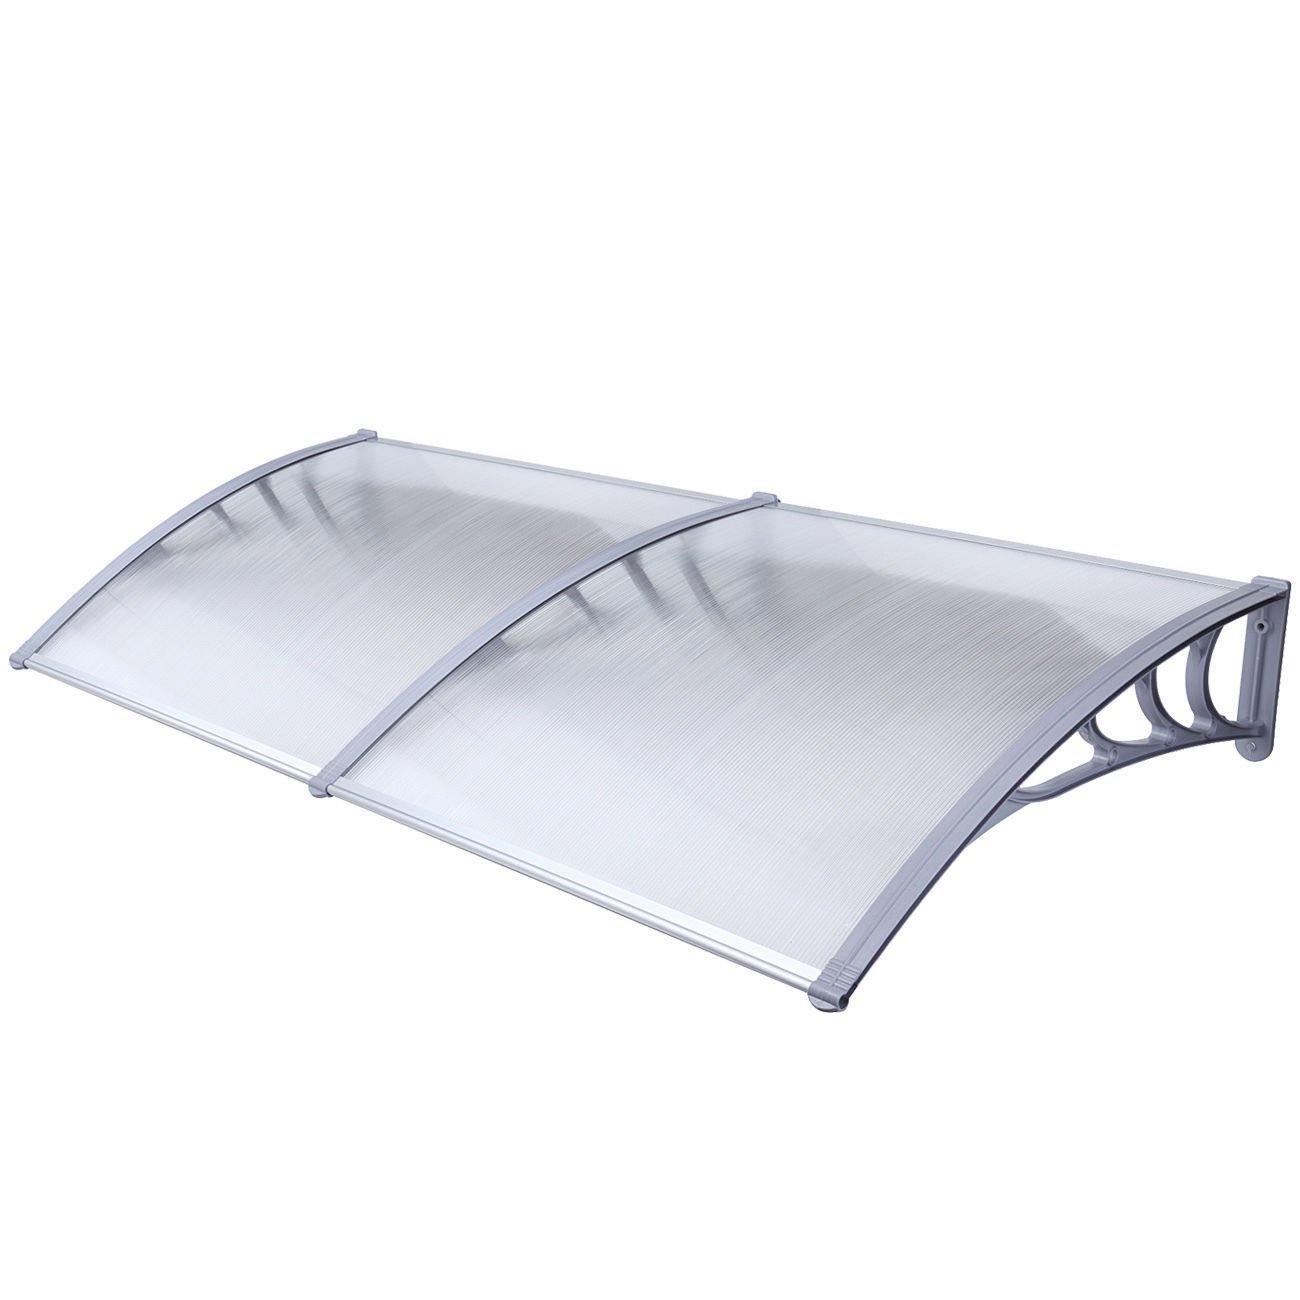 ALEKO DC40X80 Polycarbonate Outdoor Window or Door Canopy 40 x 80 Inches Gray by ALEKO